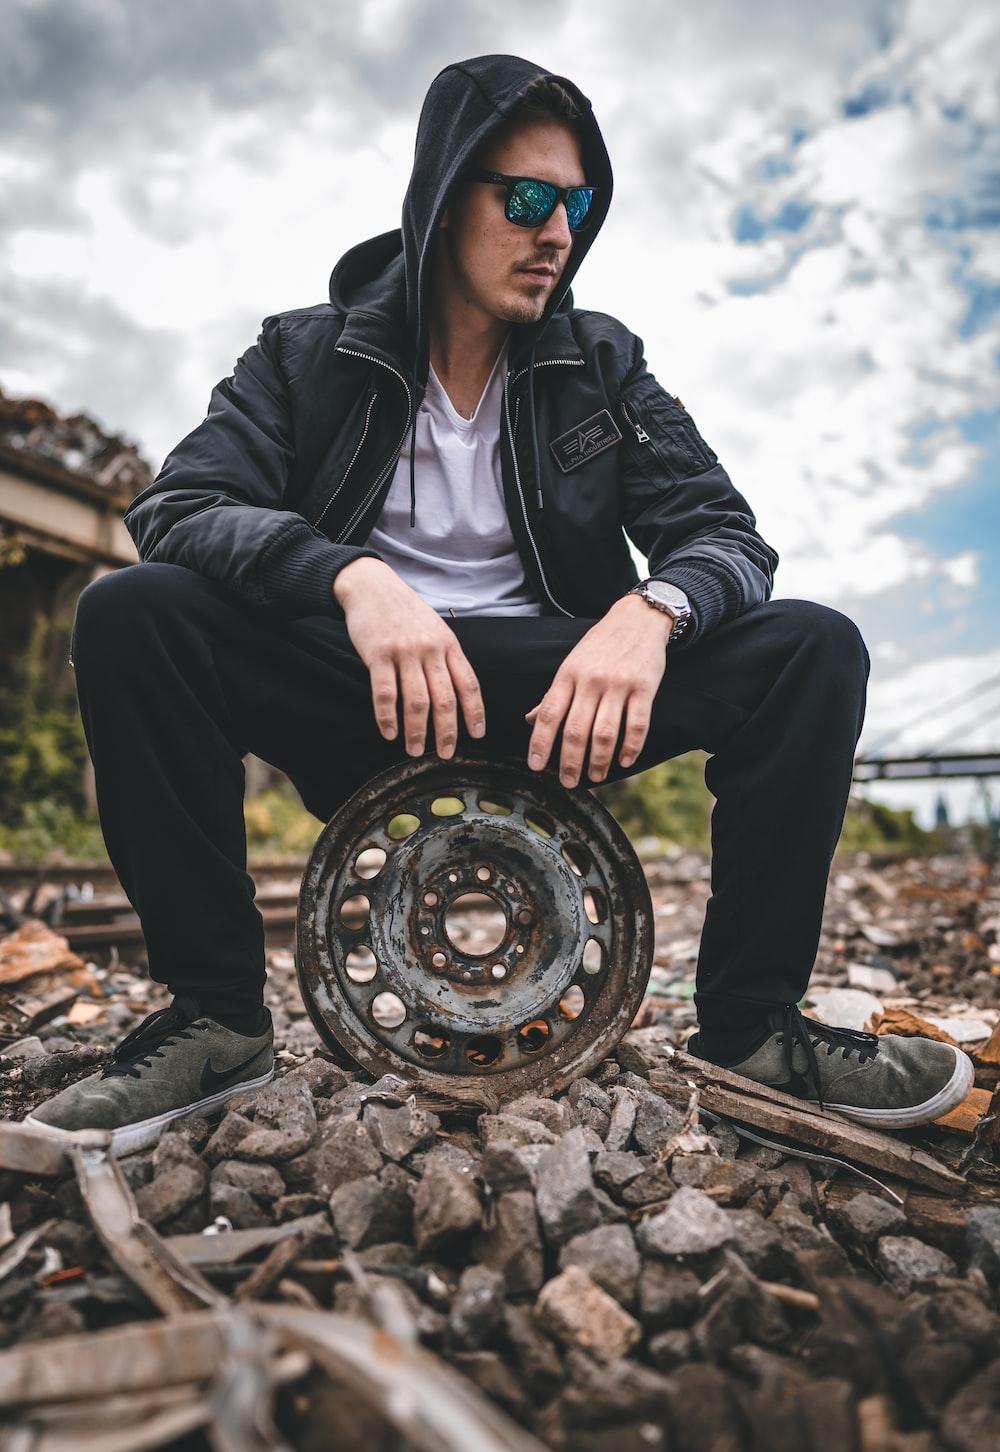 man in black leather jacket and black pants sitting on brown metal wheel during daytime